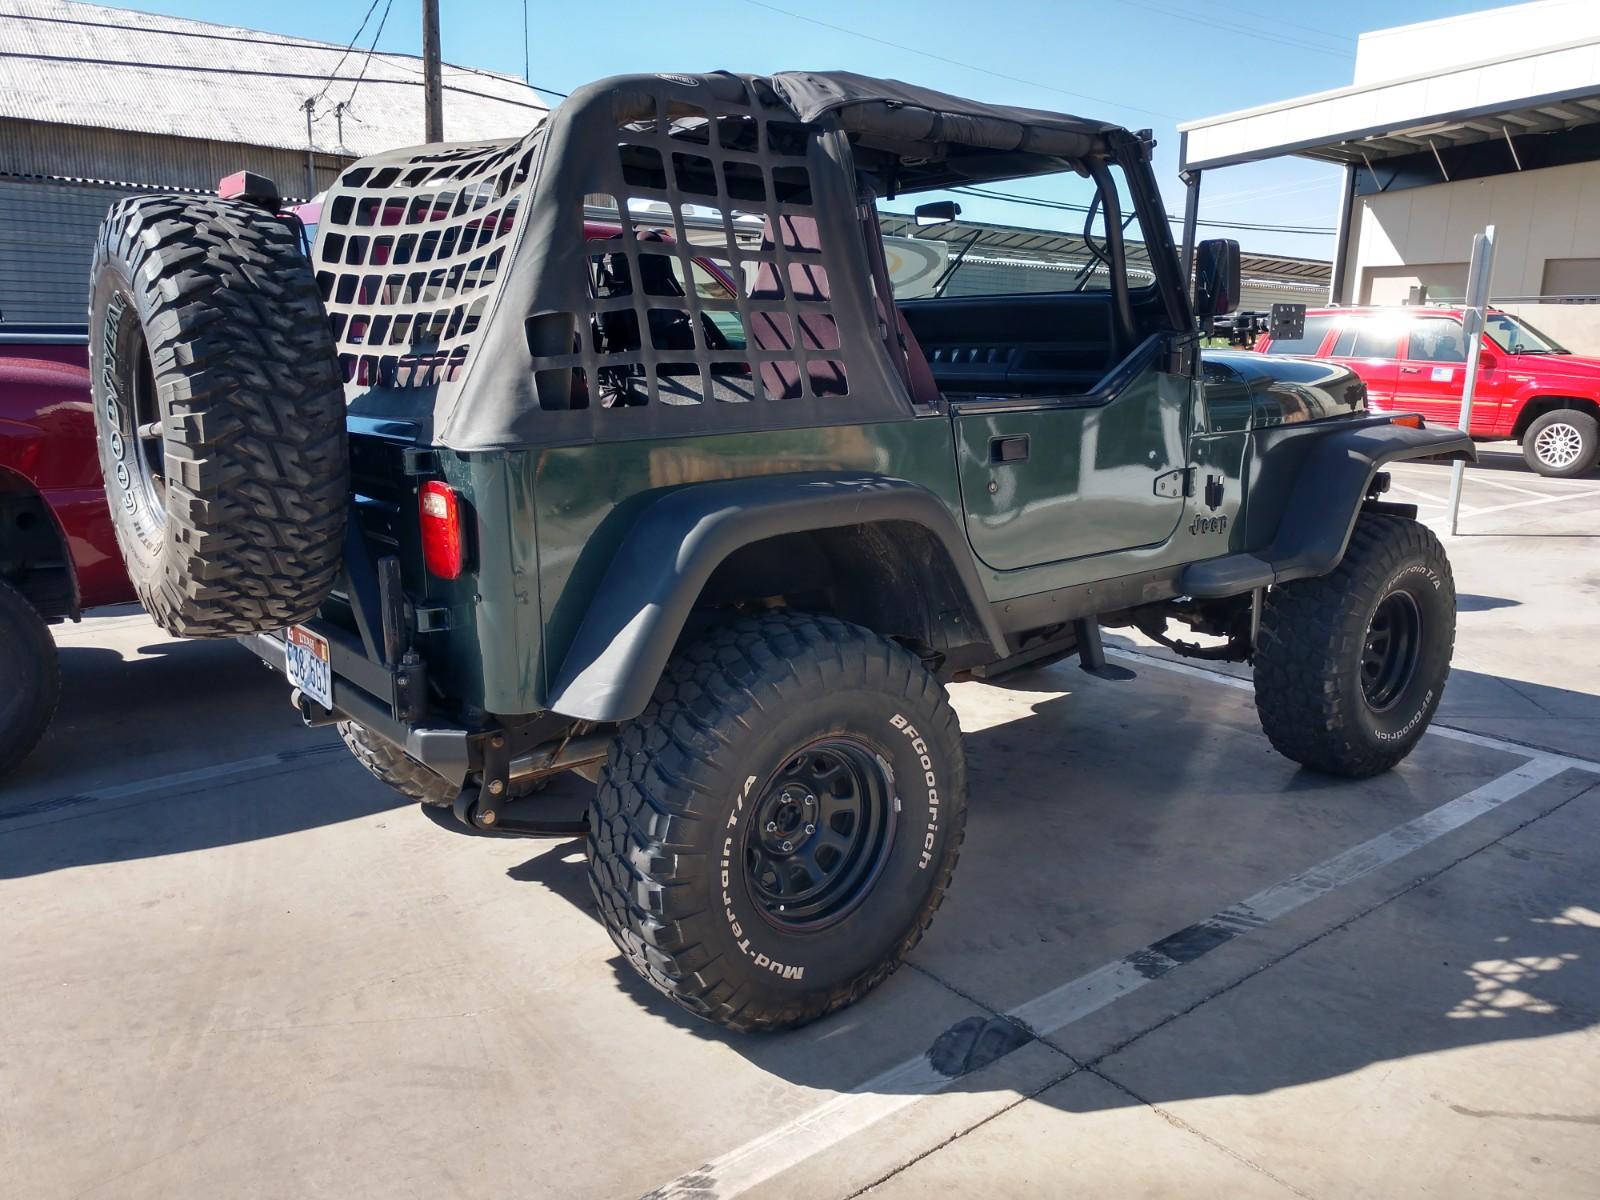 the premier auto shop in moab utah dixie 4 wheel drive dixie 4